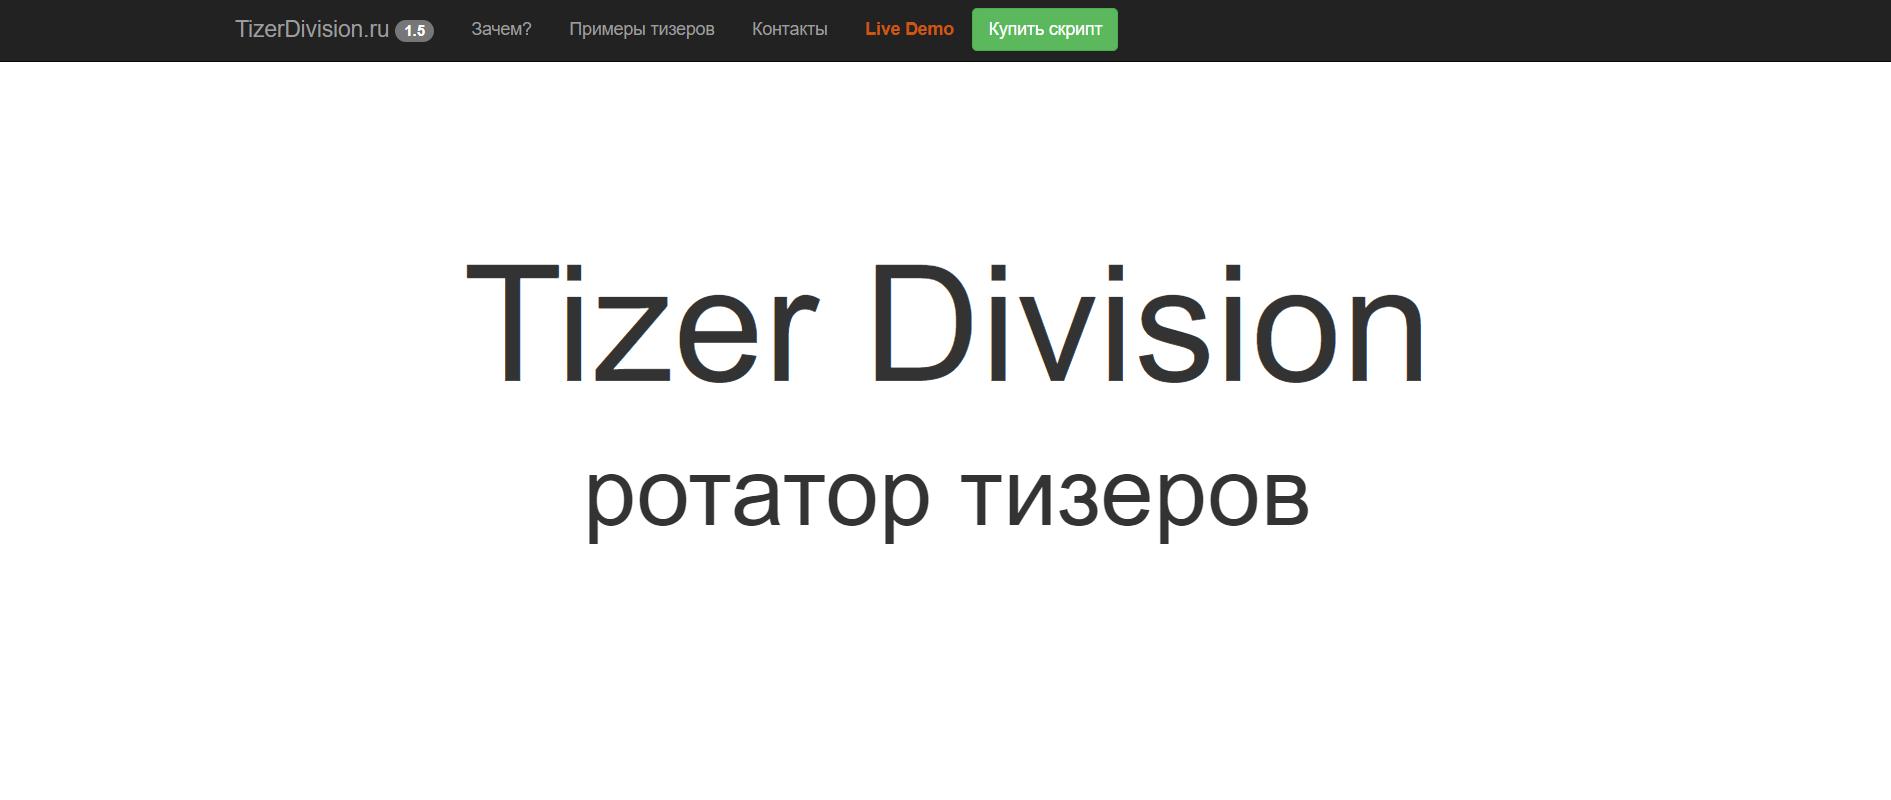 Tizer Division